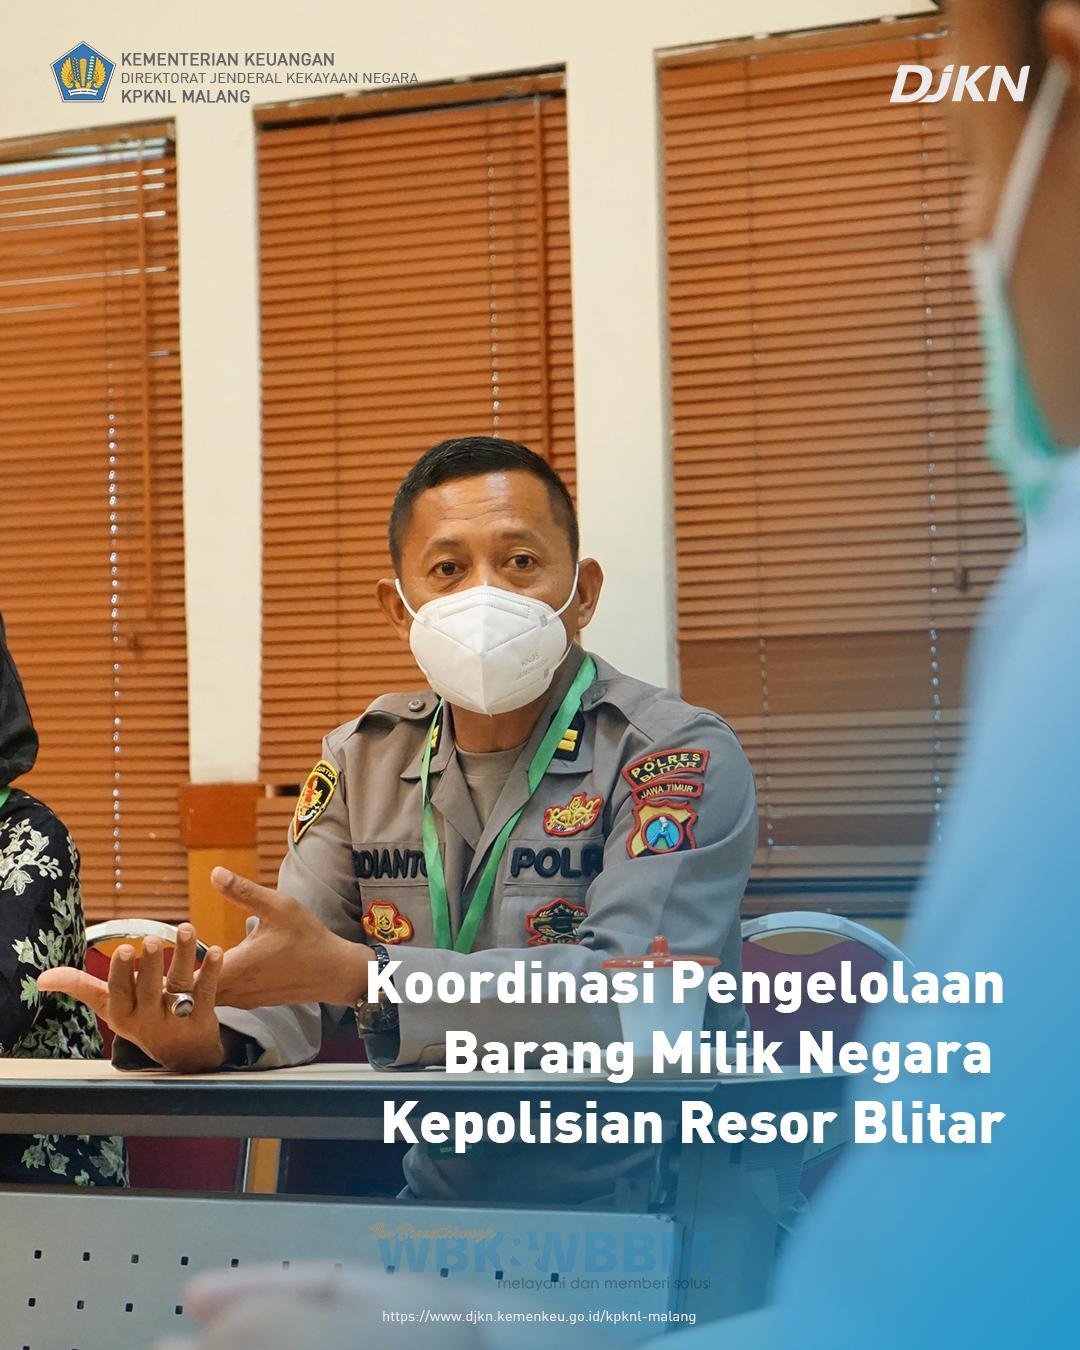 Koordinasi Pengelolaan Barang Milik Negara Kepolisian Resor Blitar